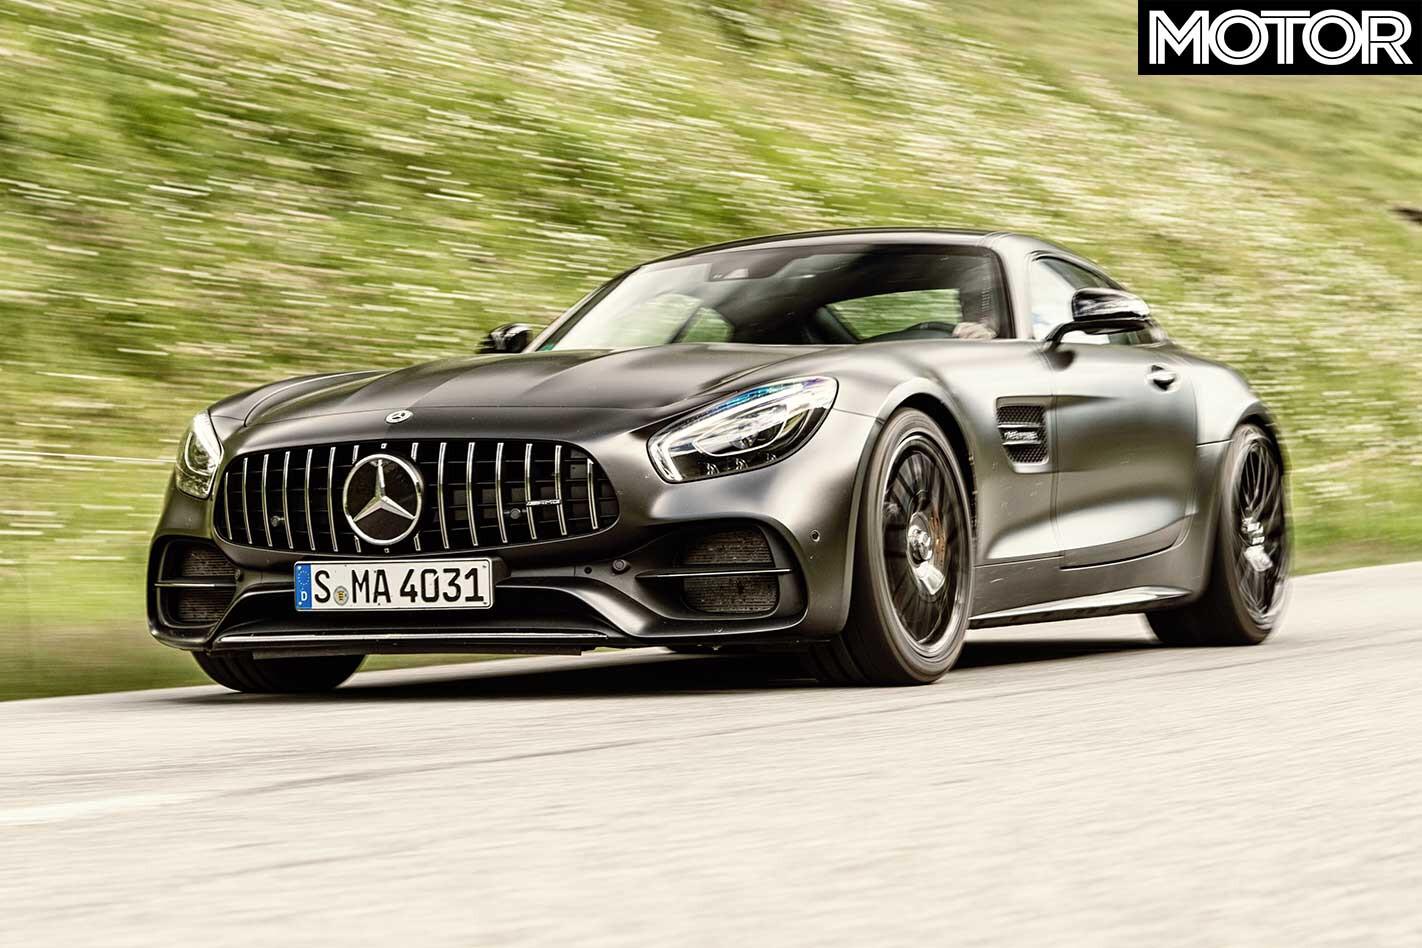 MOTOR PCOTY 2019 Mercedes AMG GT C Jpg